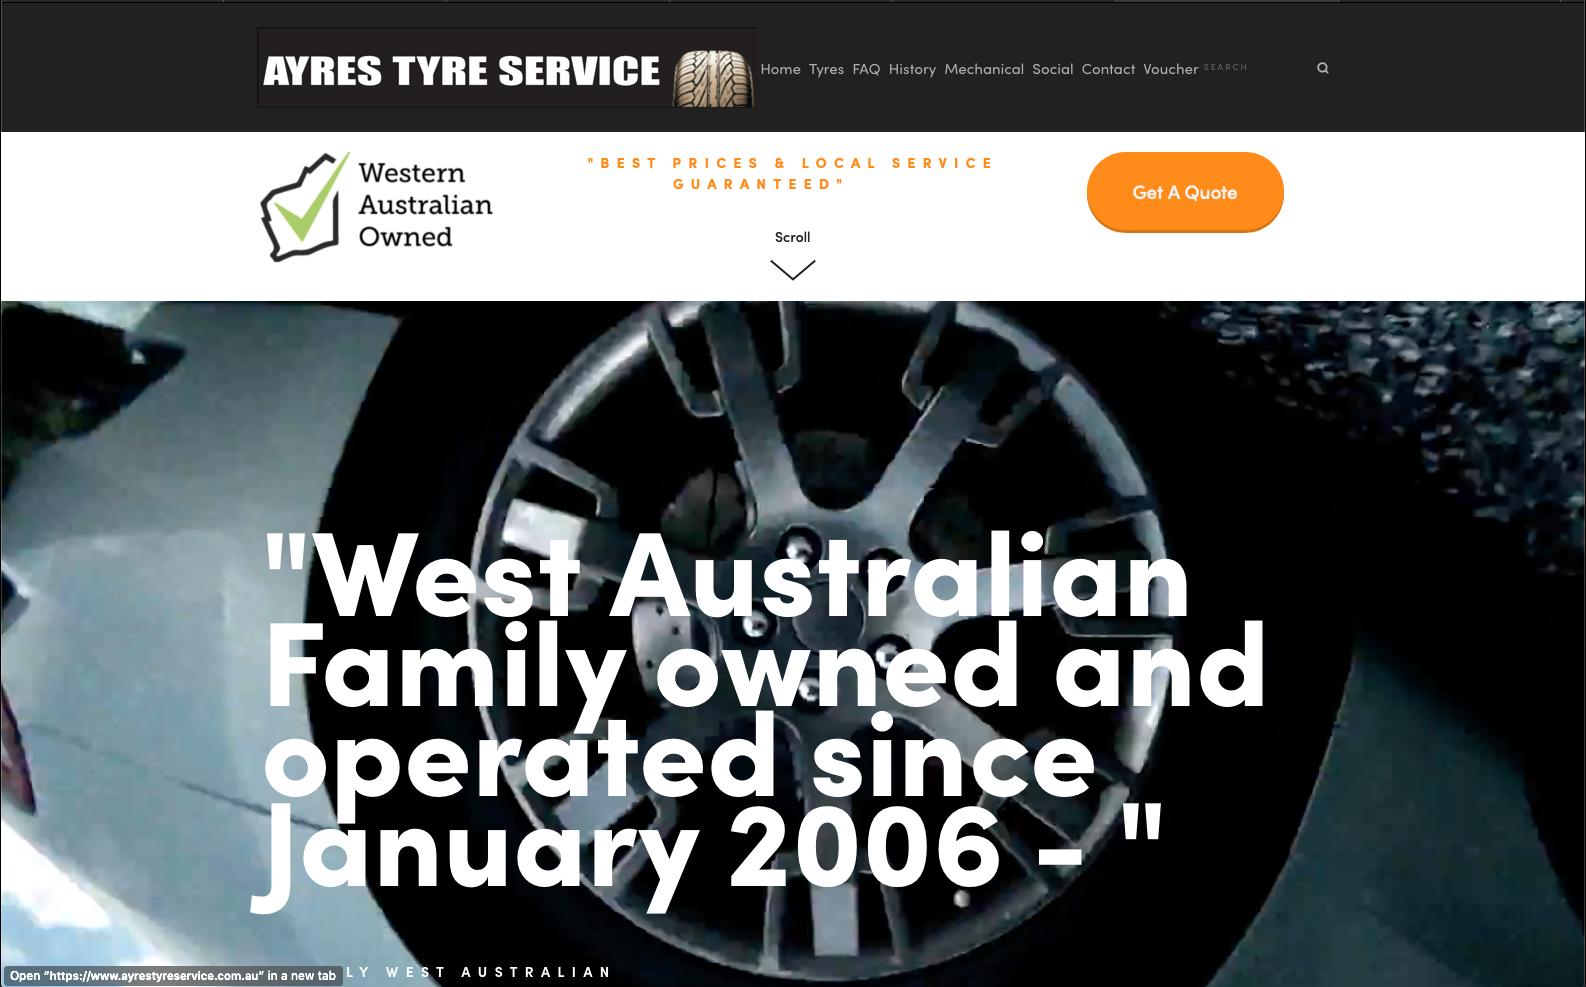 Ayrestyreservice.com.au